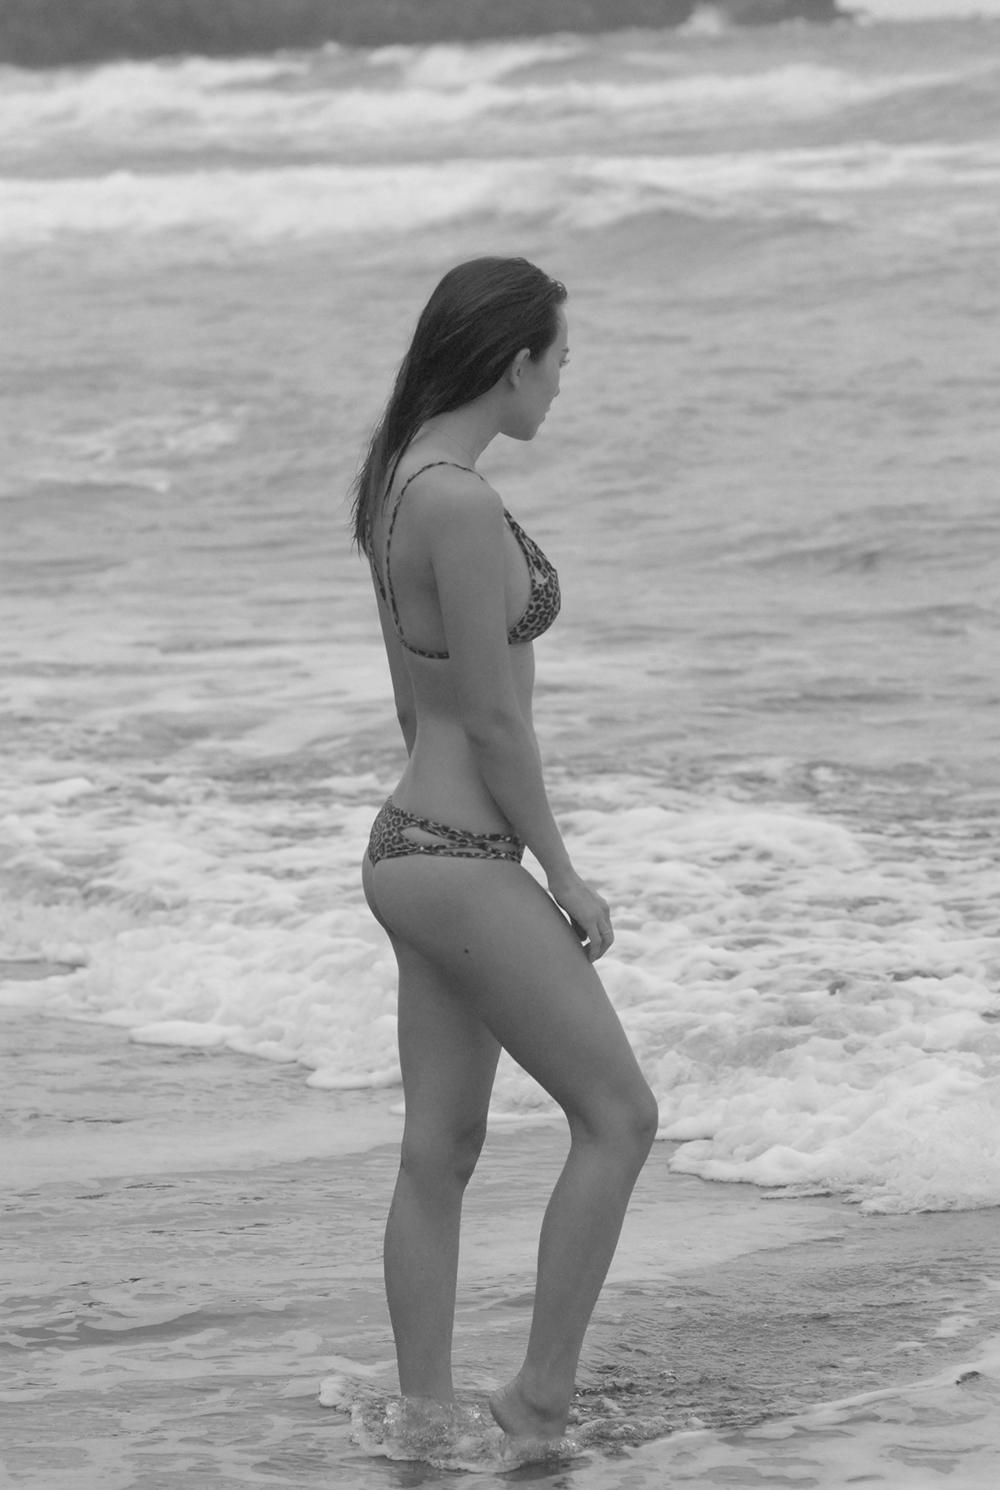 Swimbook_swimsuit_Acacia_Marlie_Hinshaw_DSC_0228BW.JPG